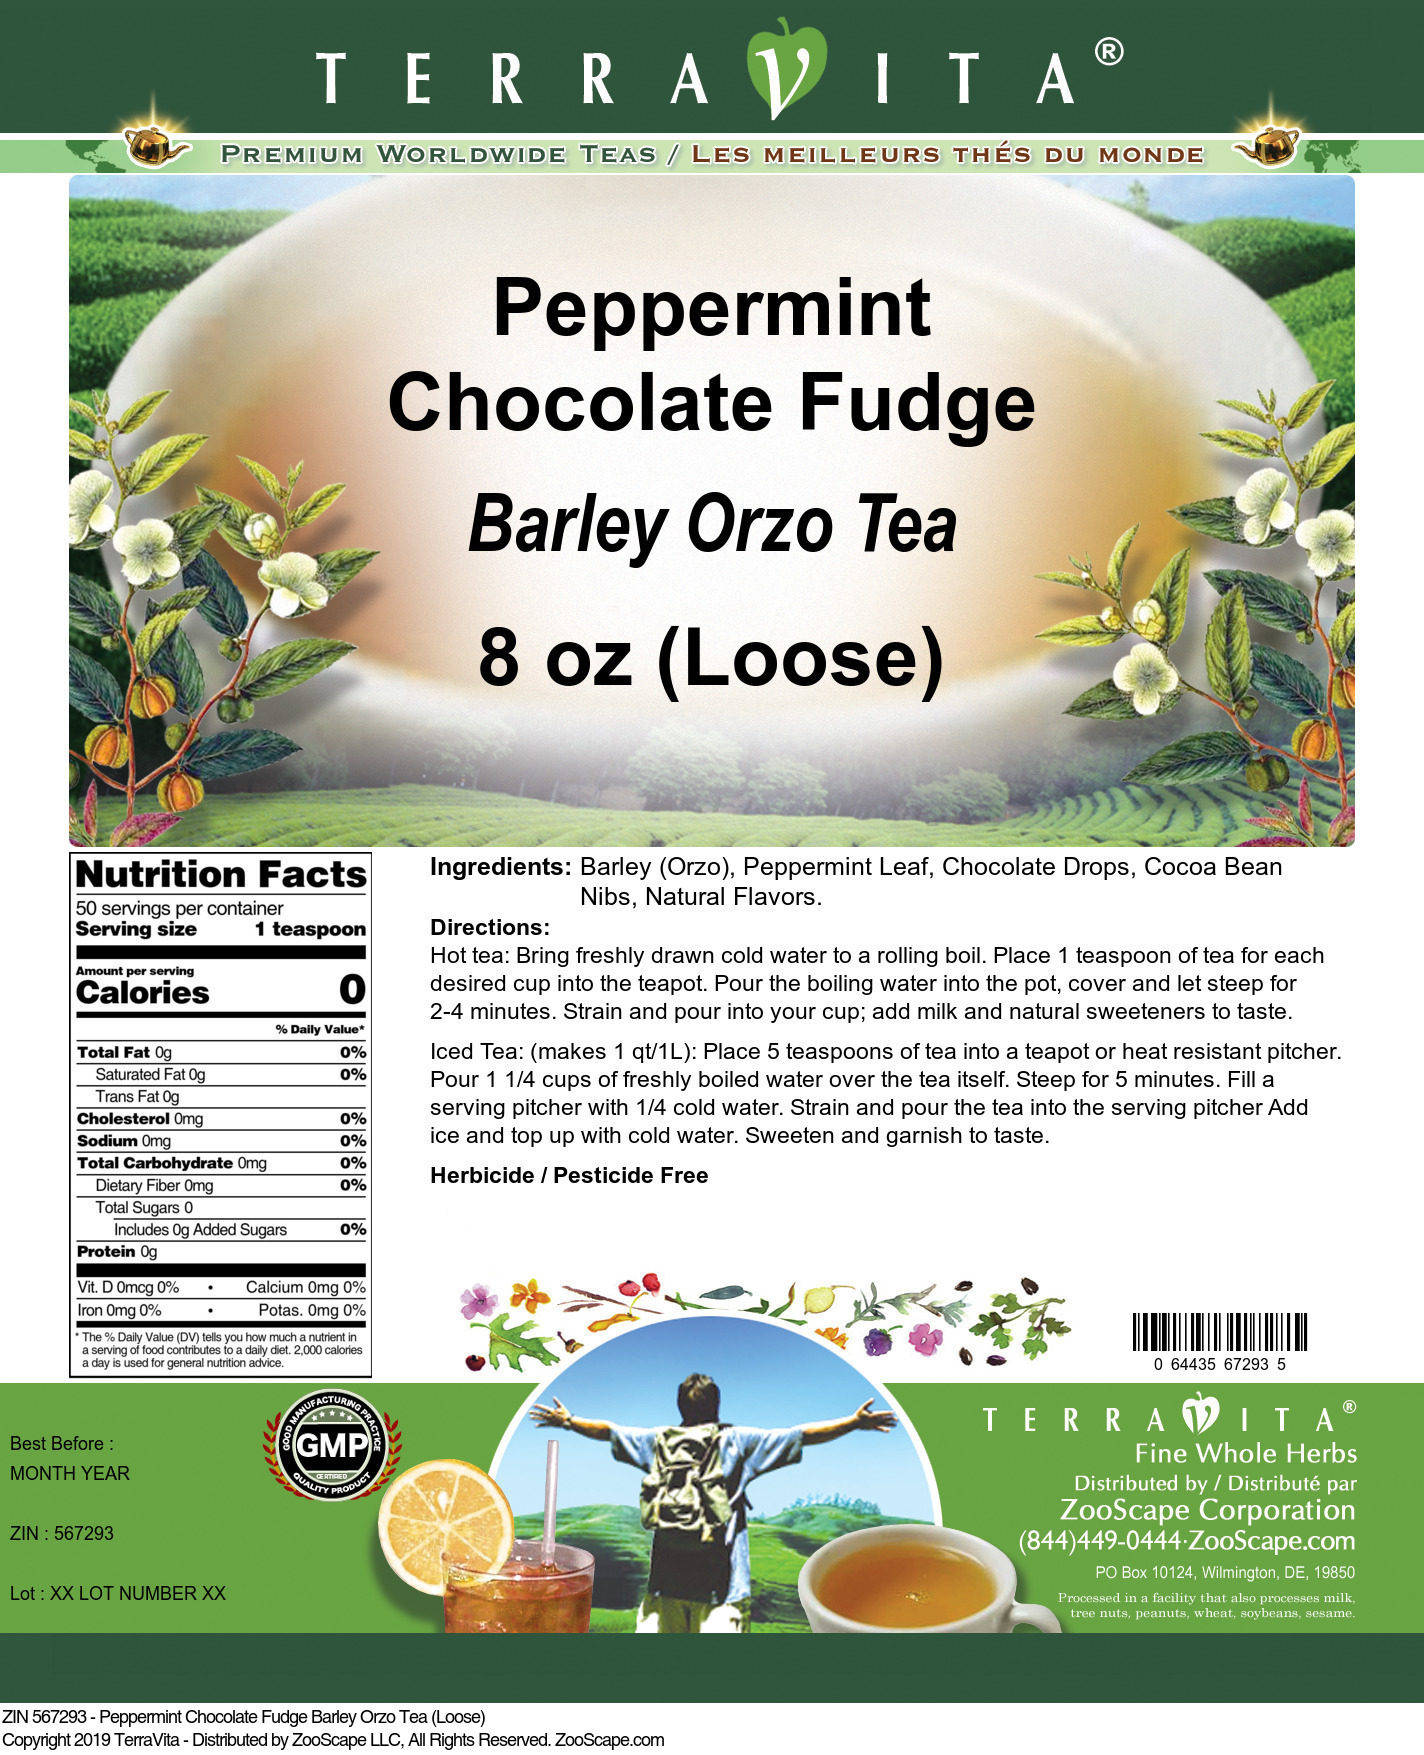 Peppermint Chocolate Fudge Barley Orzo